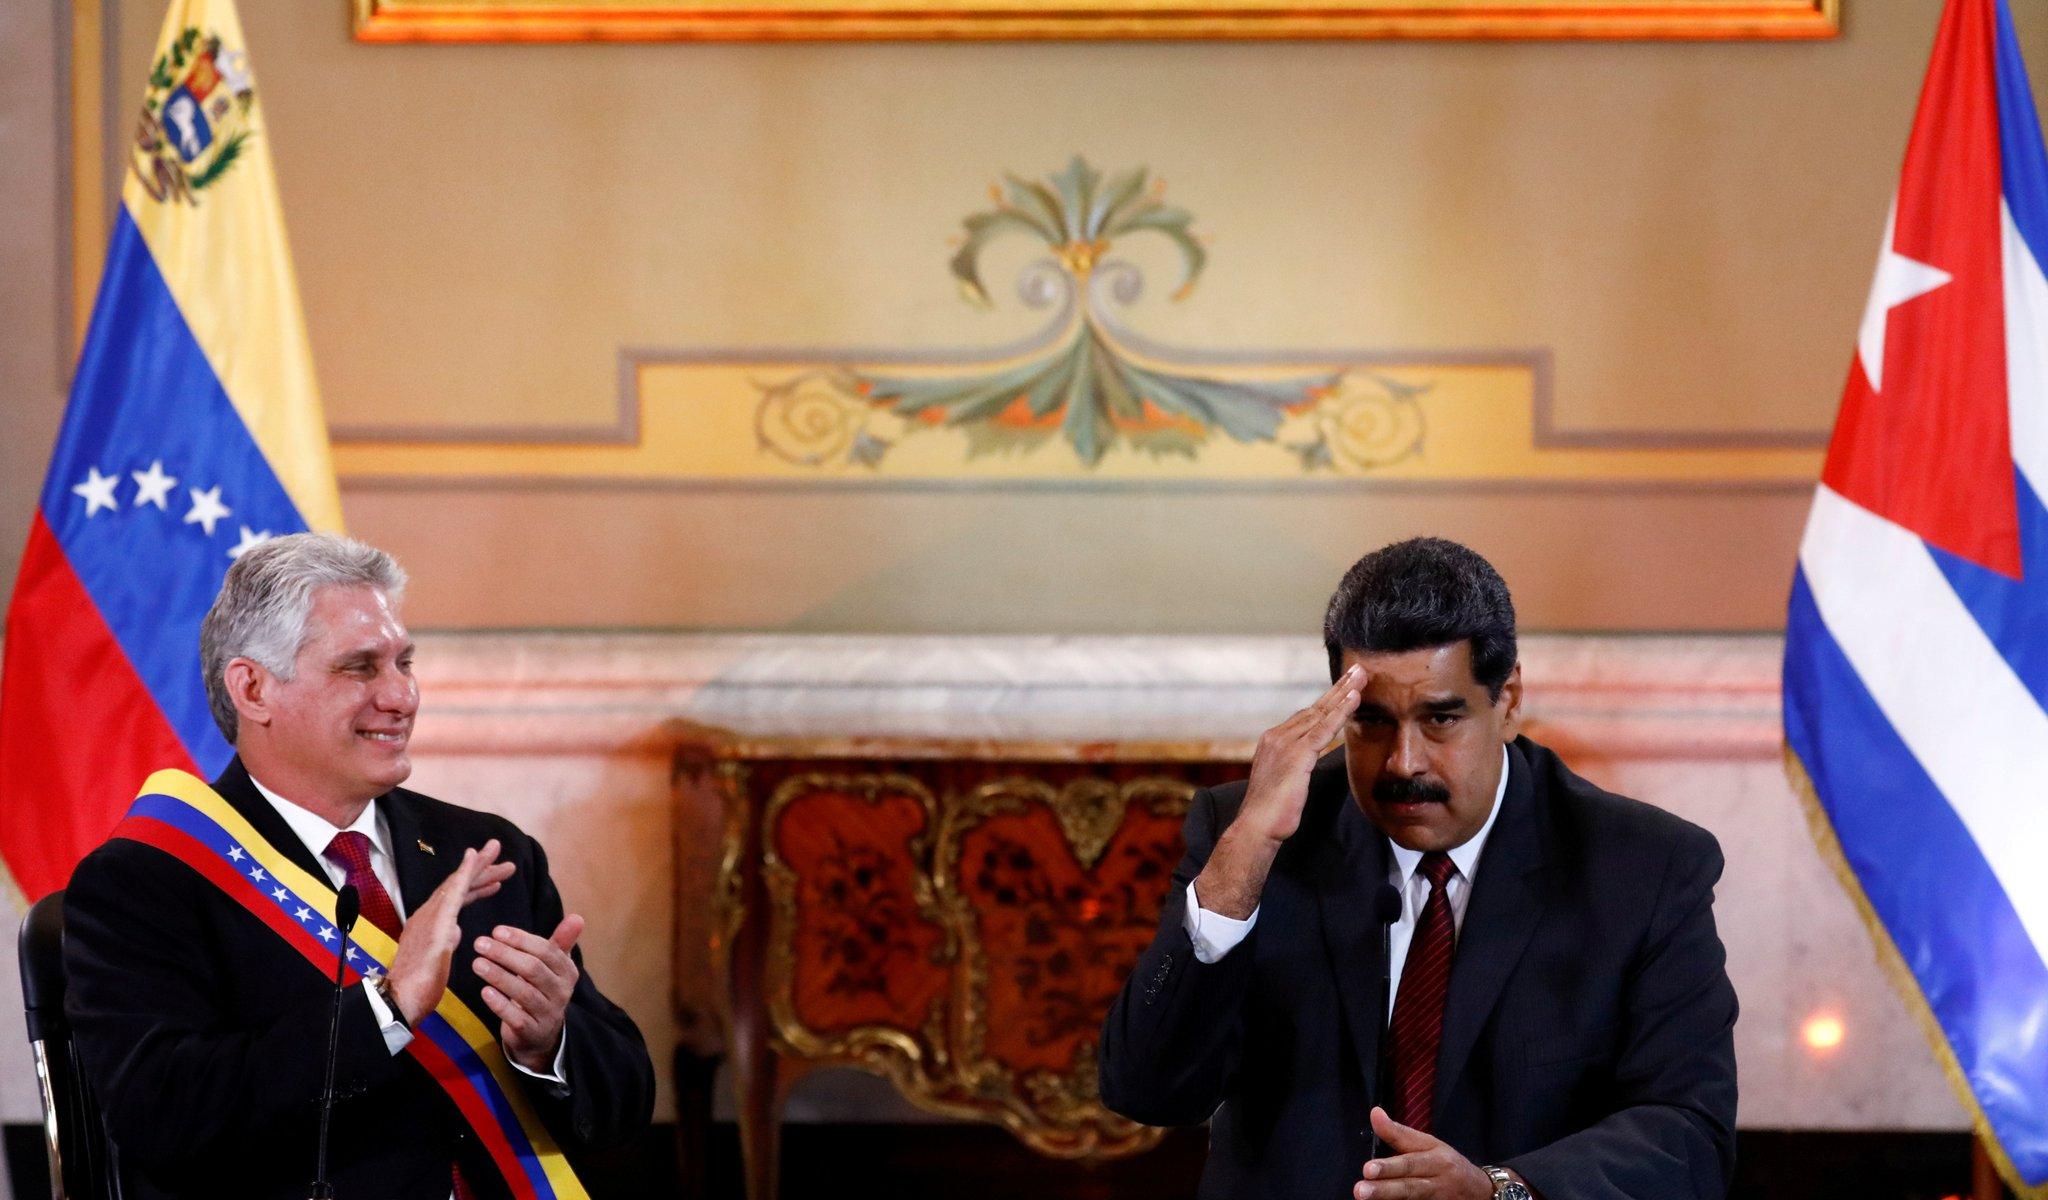 Cuba, sí, Venezuela, no? A double standard in foreign policy